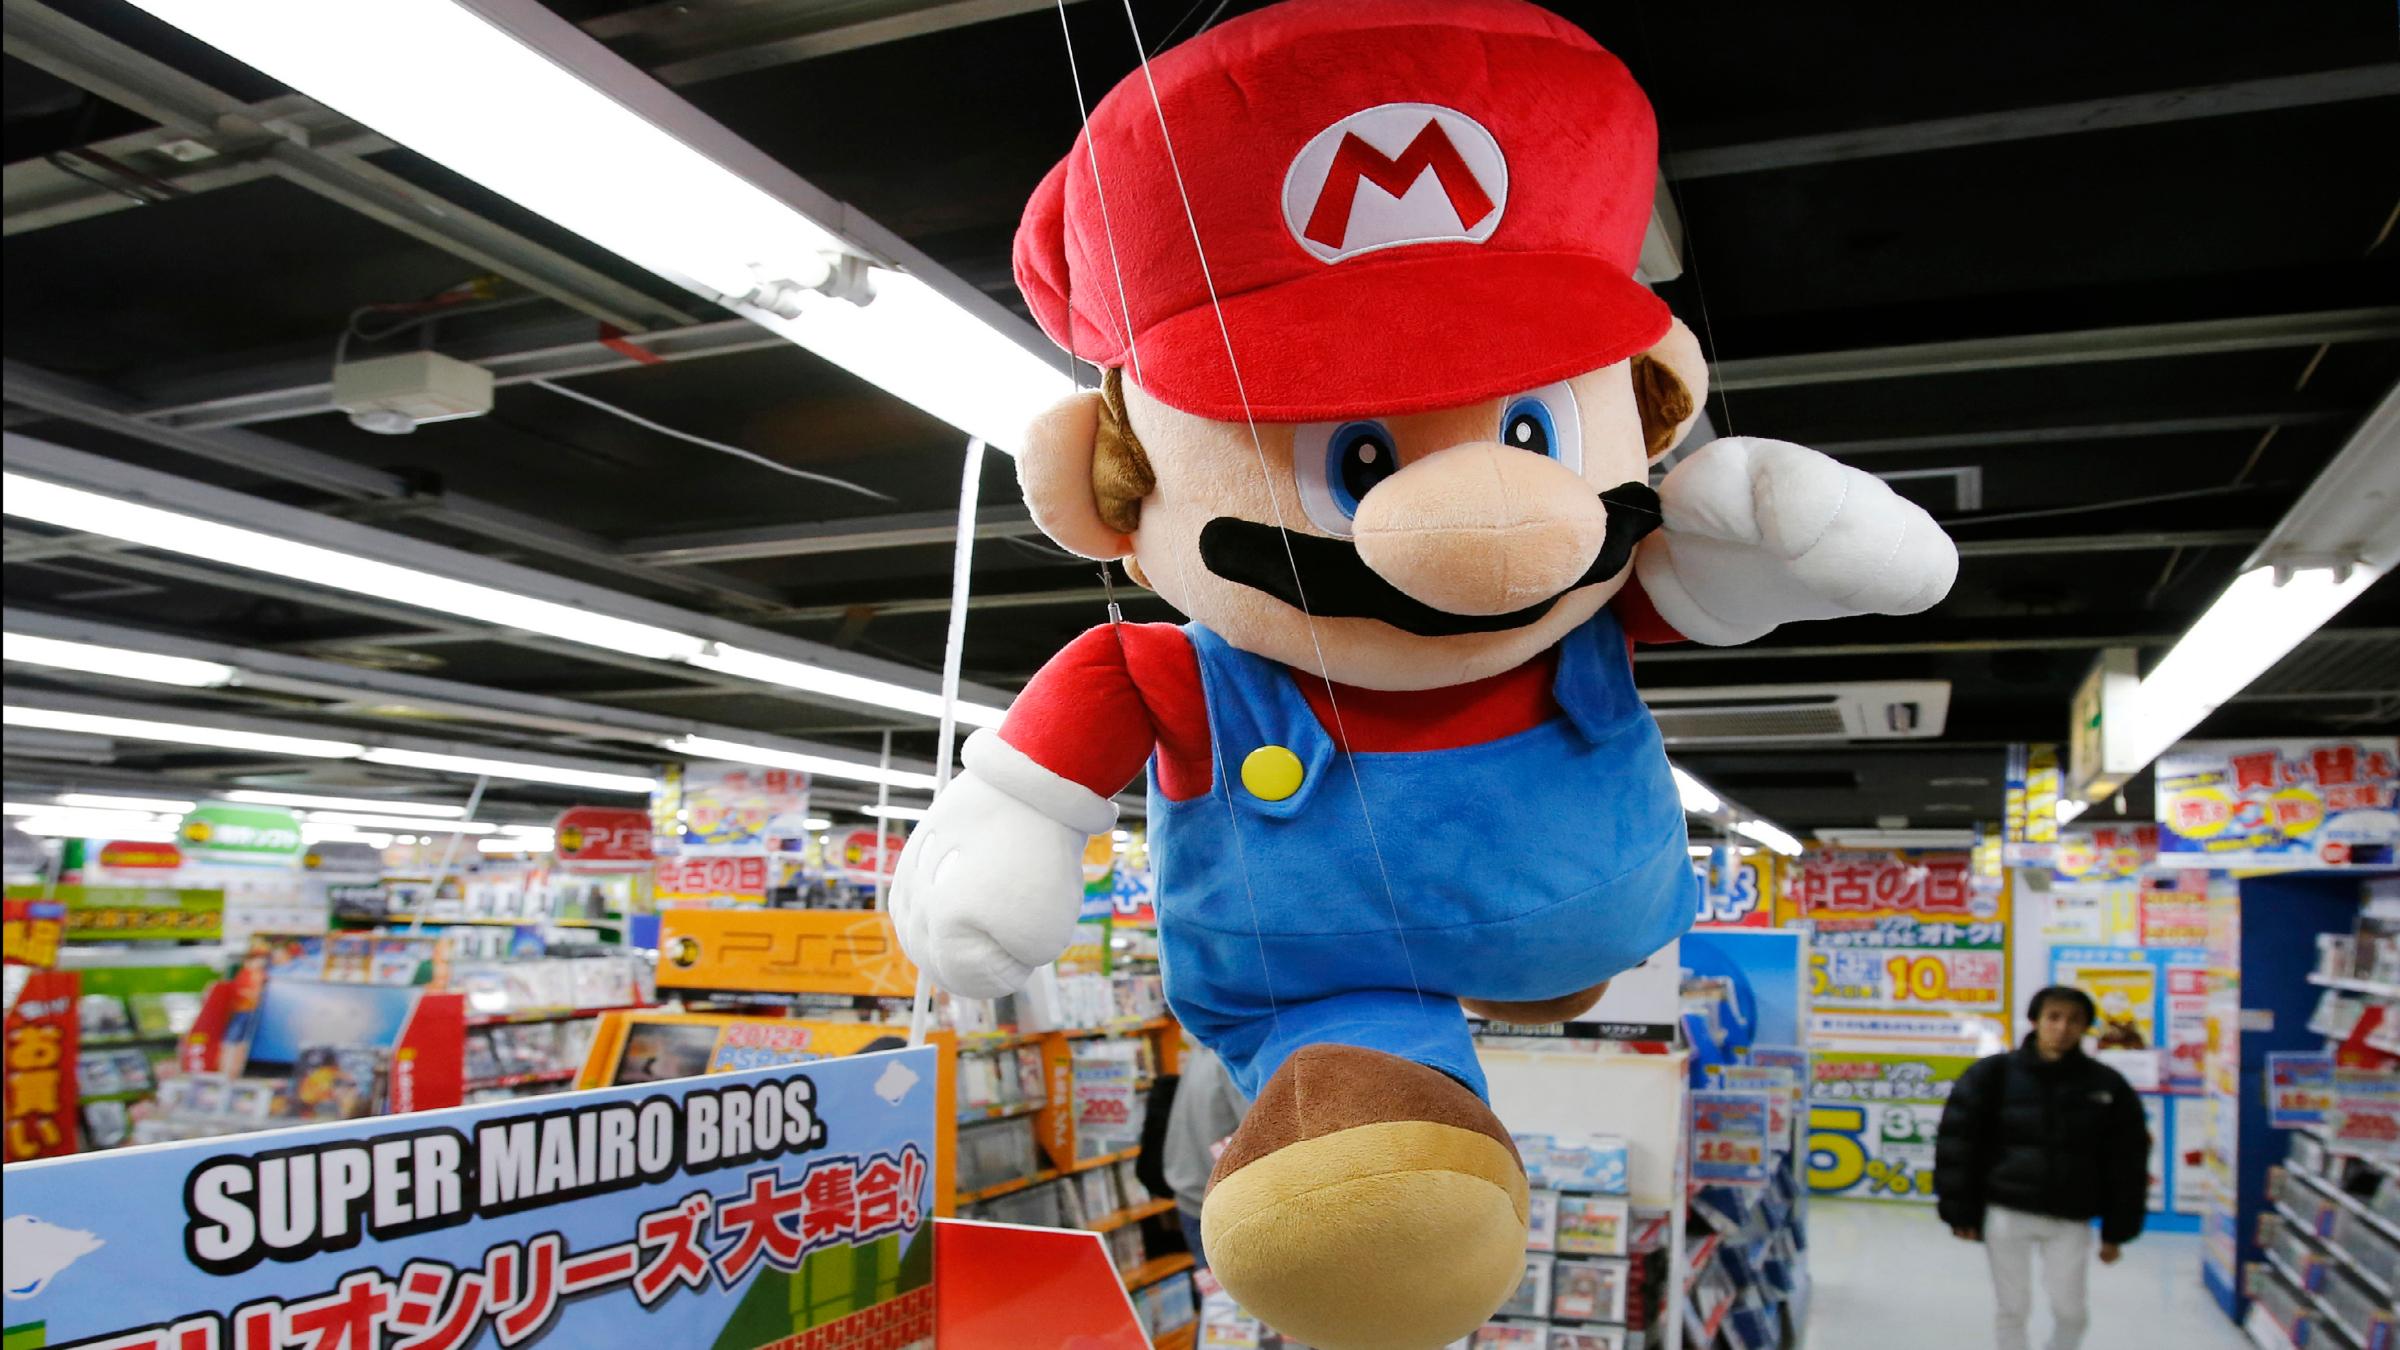 Mario running Nintendo